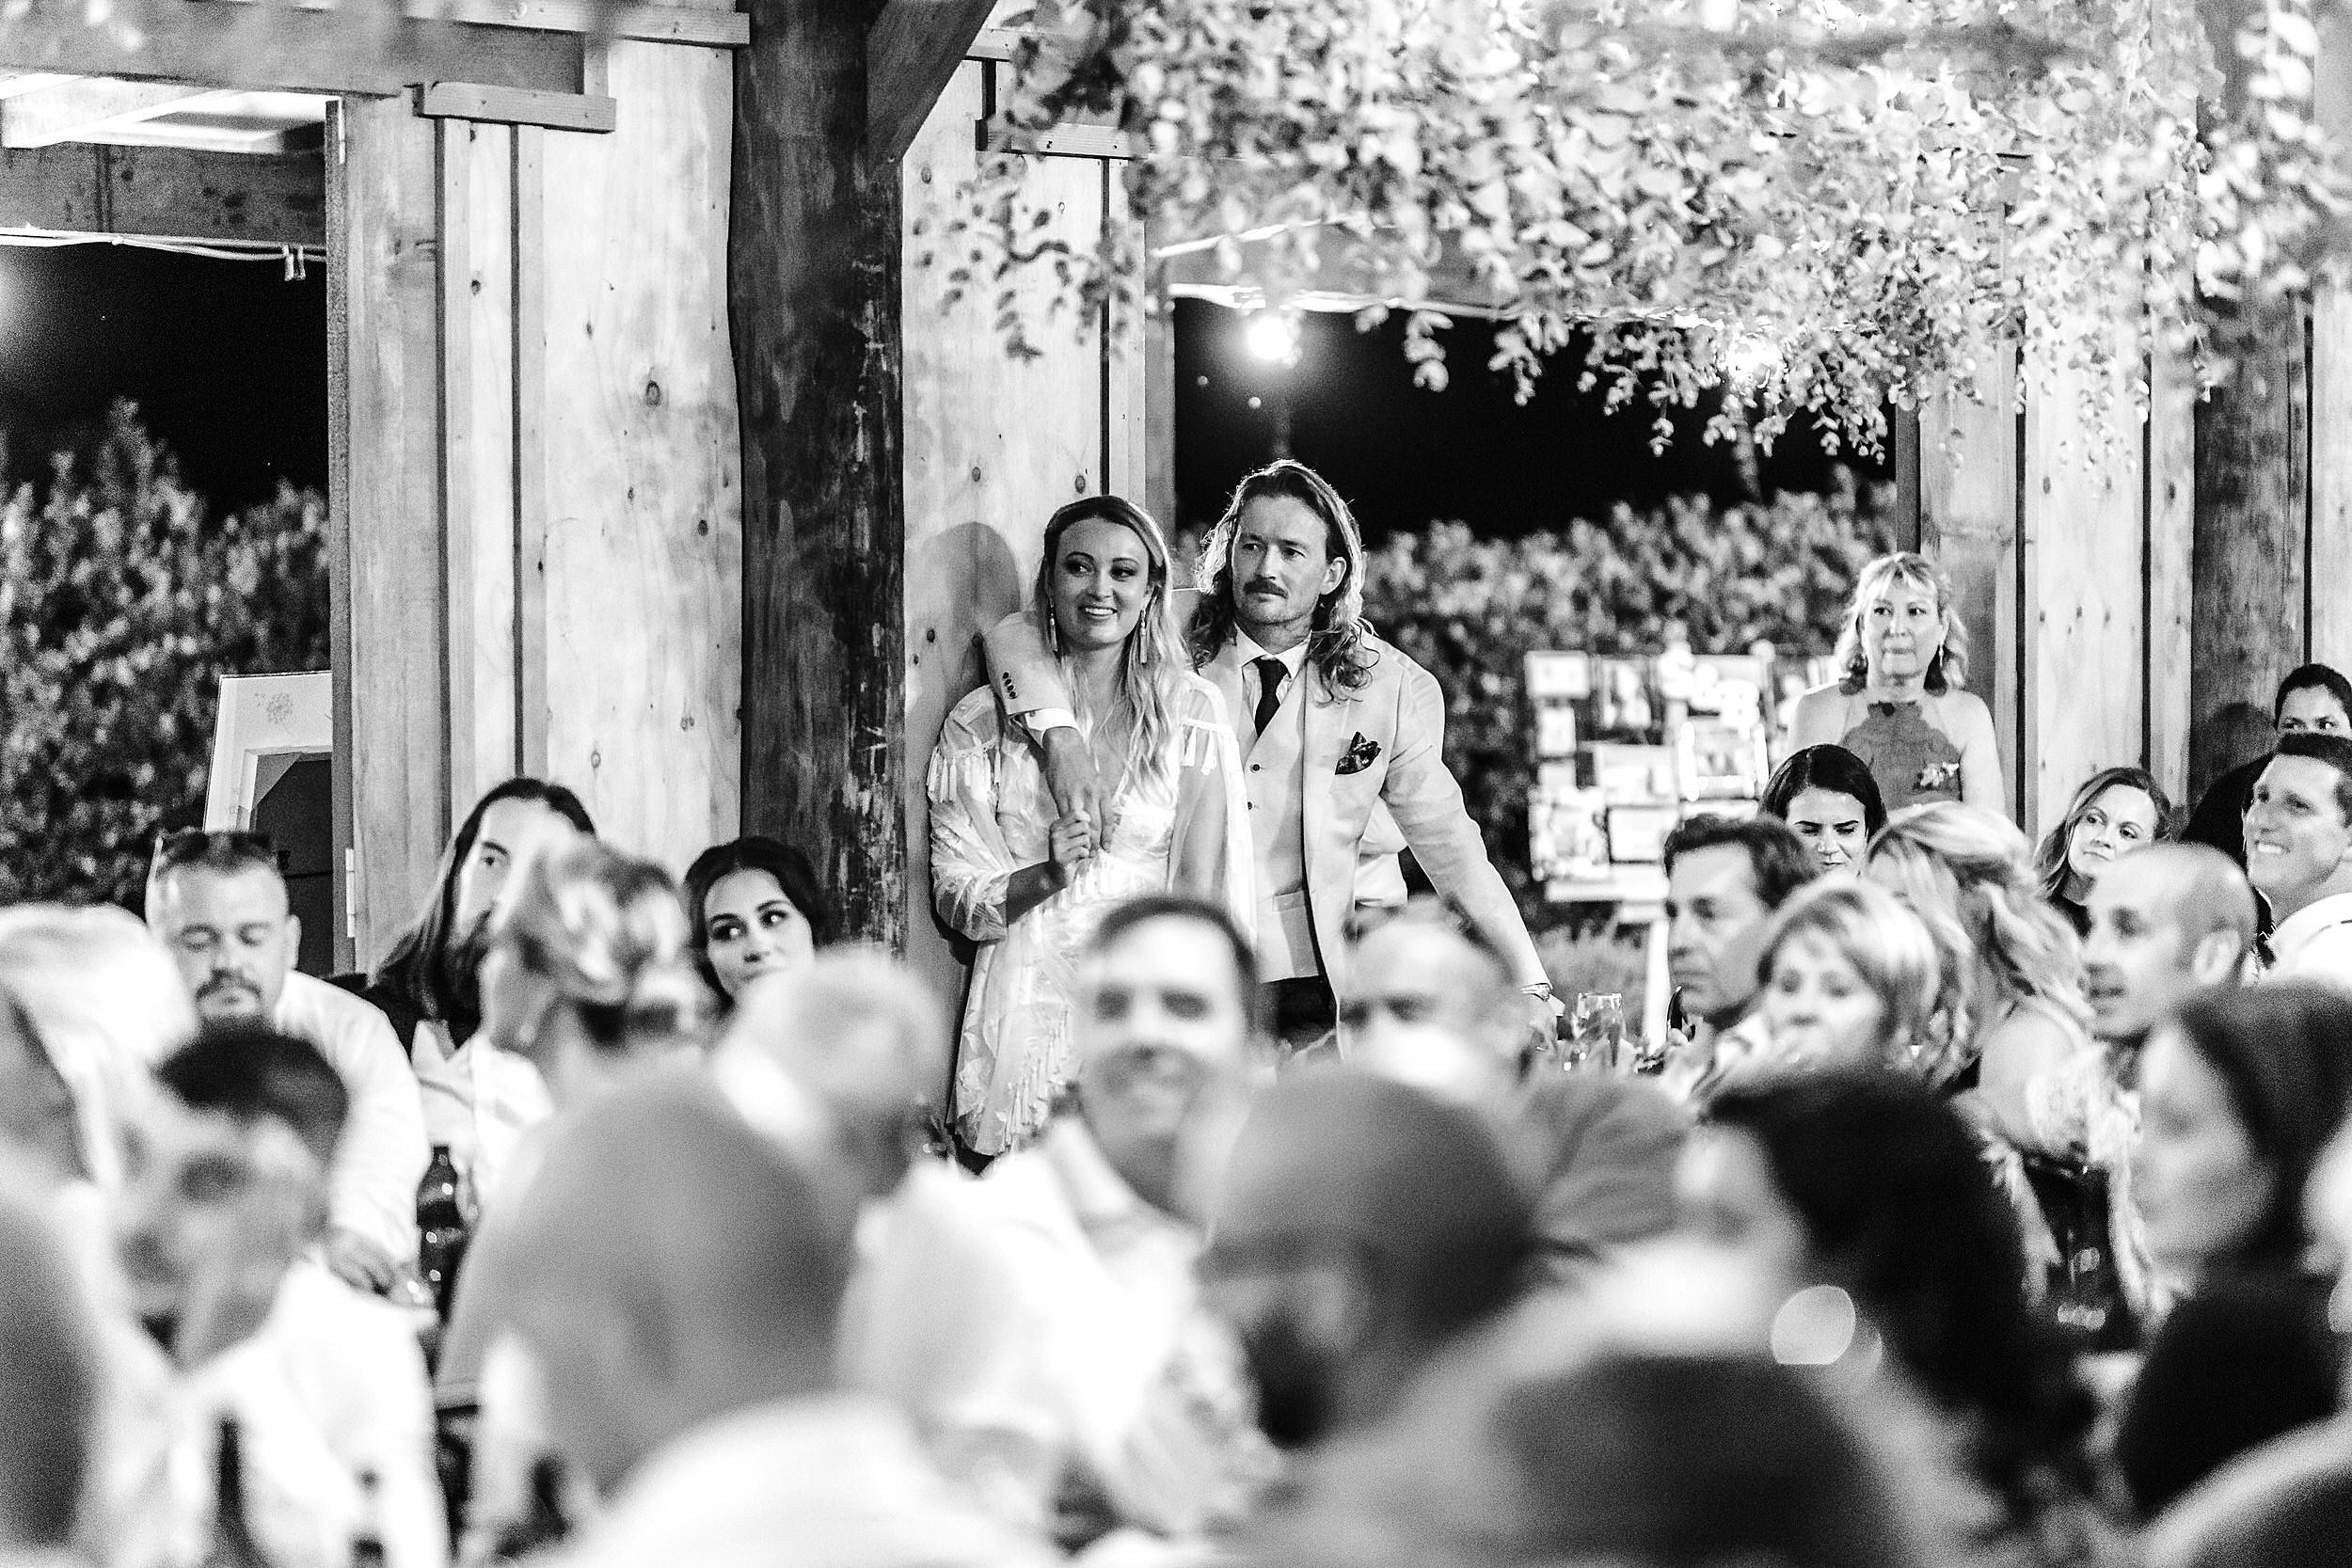 wedding_the_woolshed_steph_zac_0195.jpg